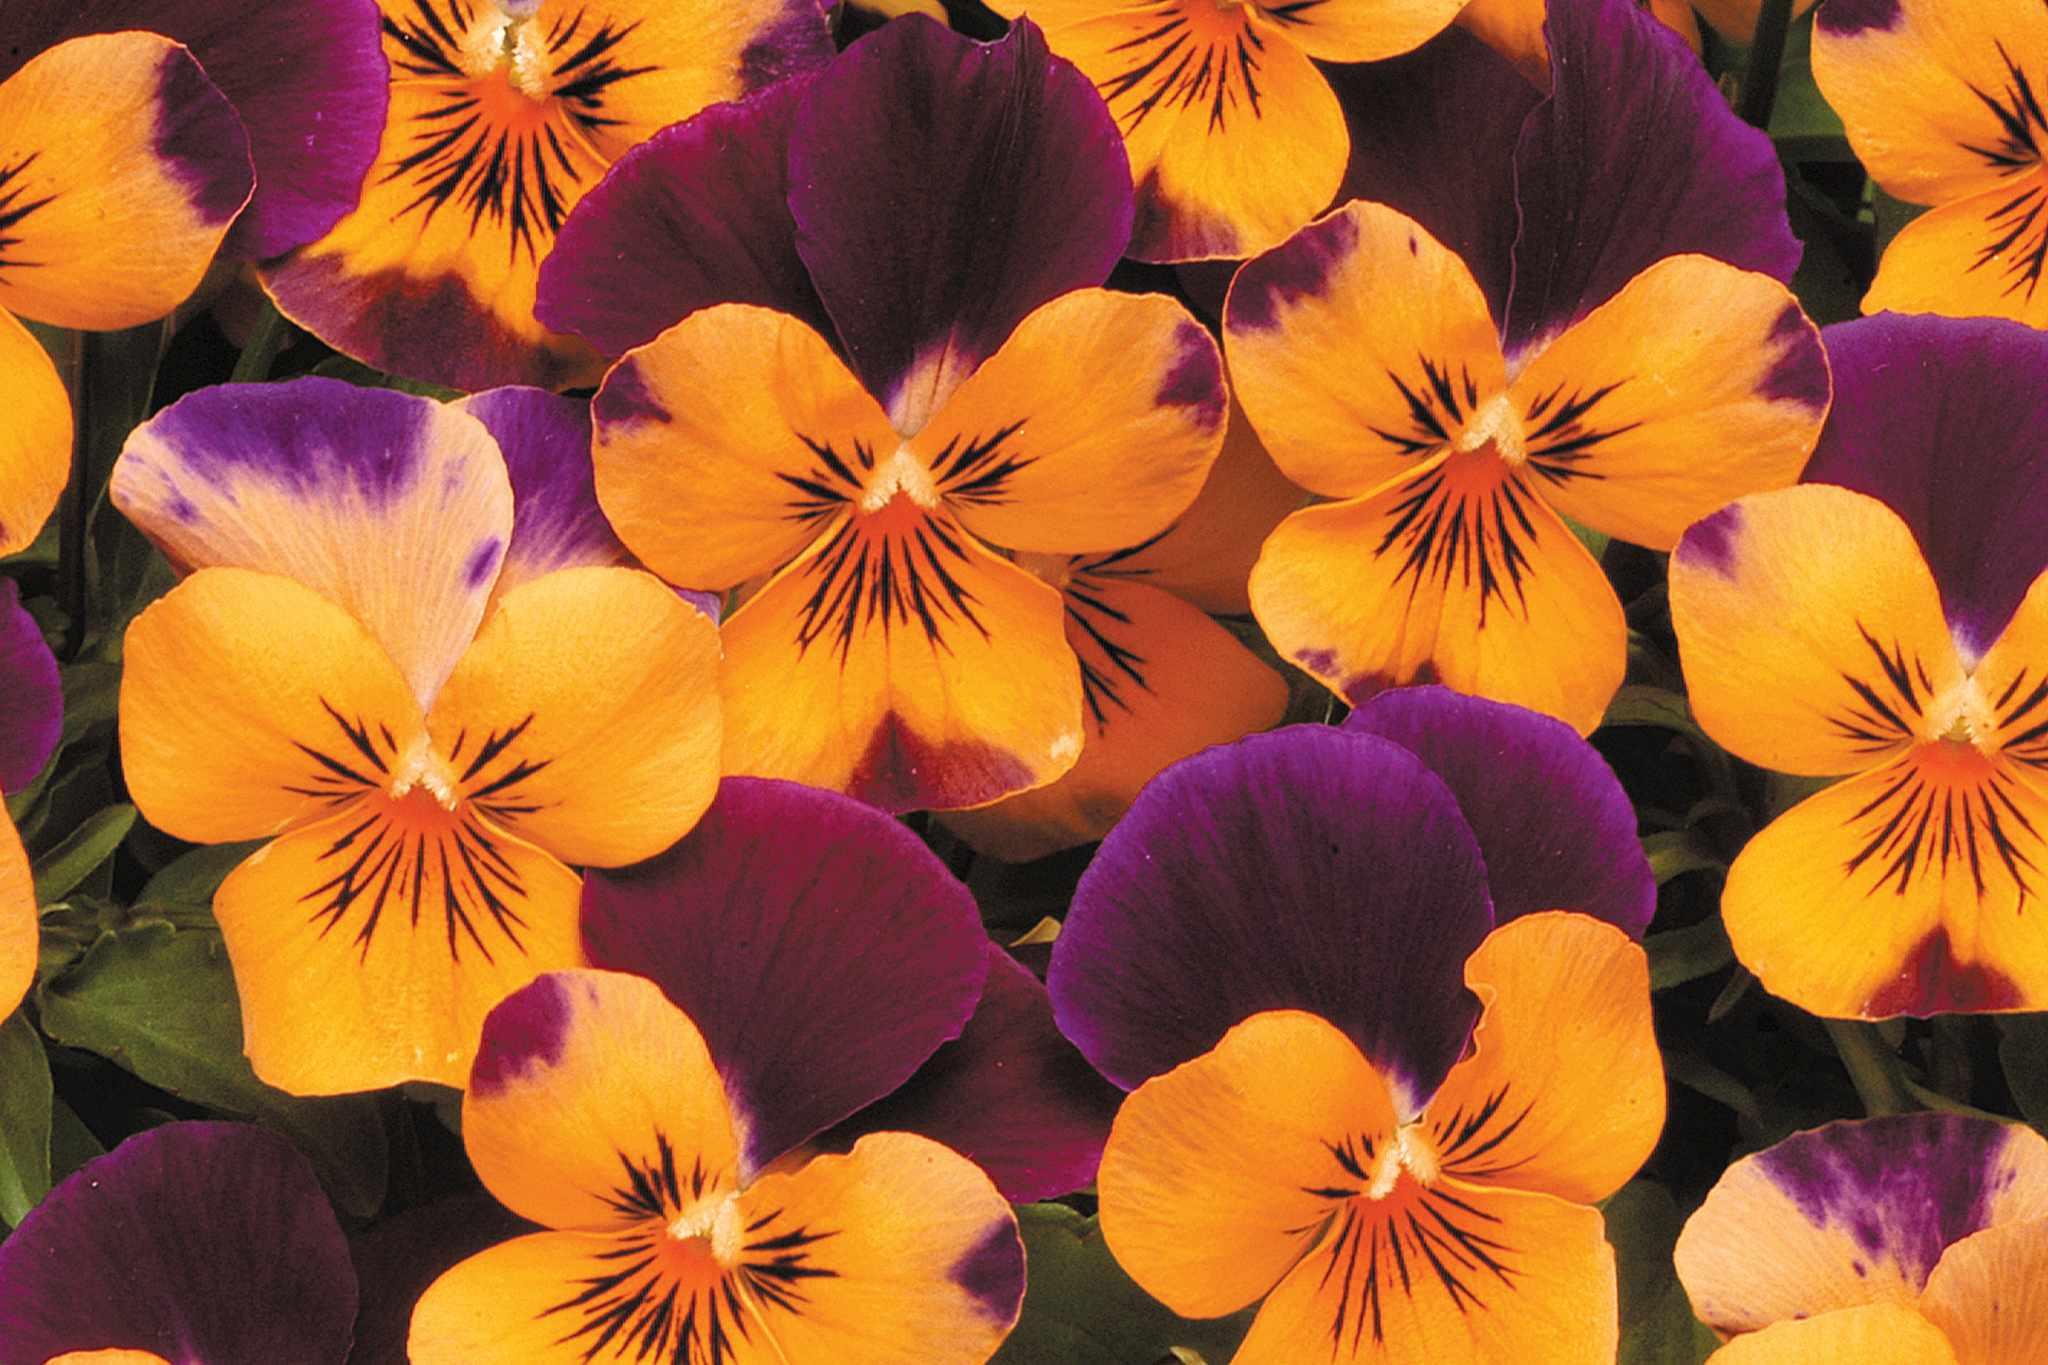 tandm-viola-sorbet-orange-2048-1365